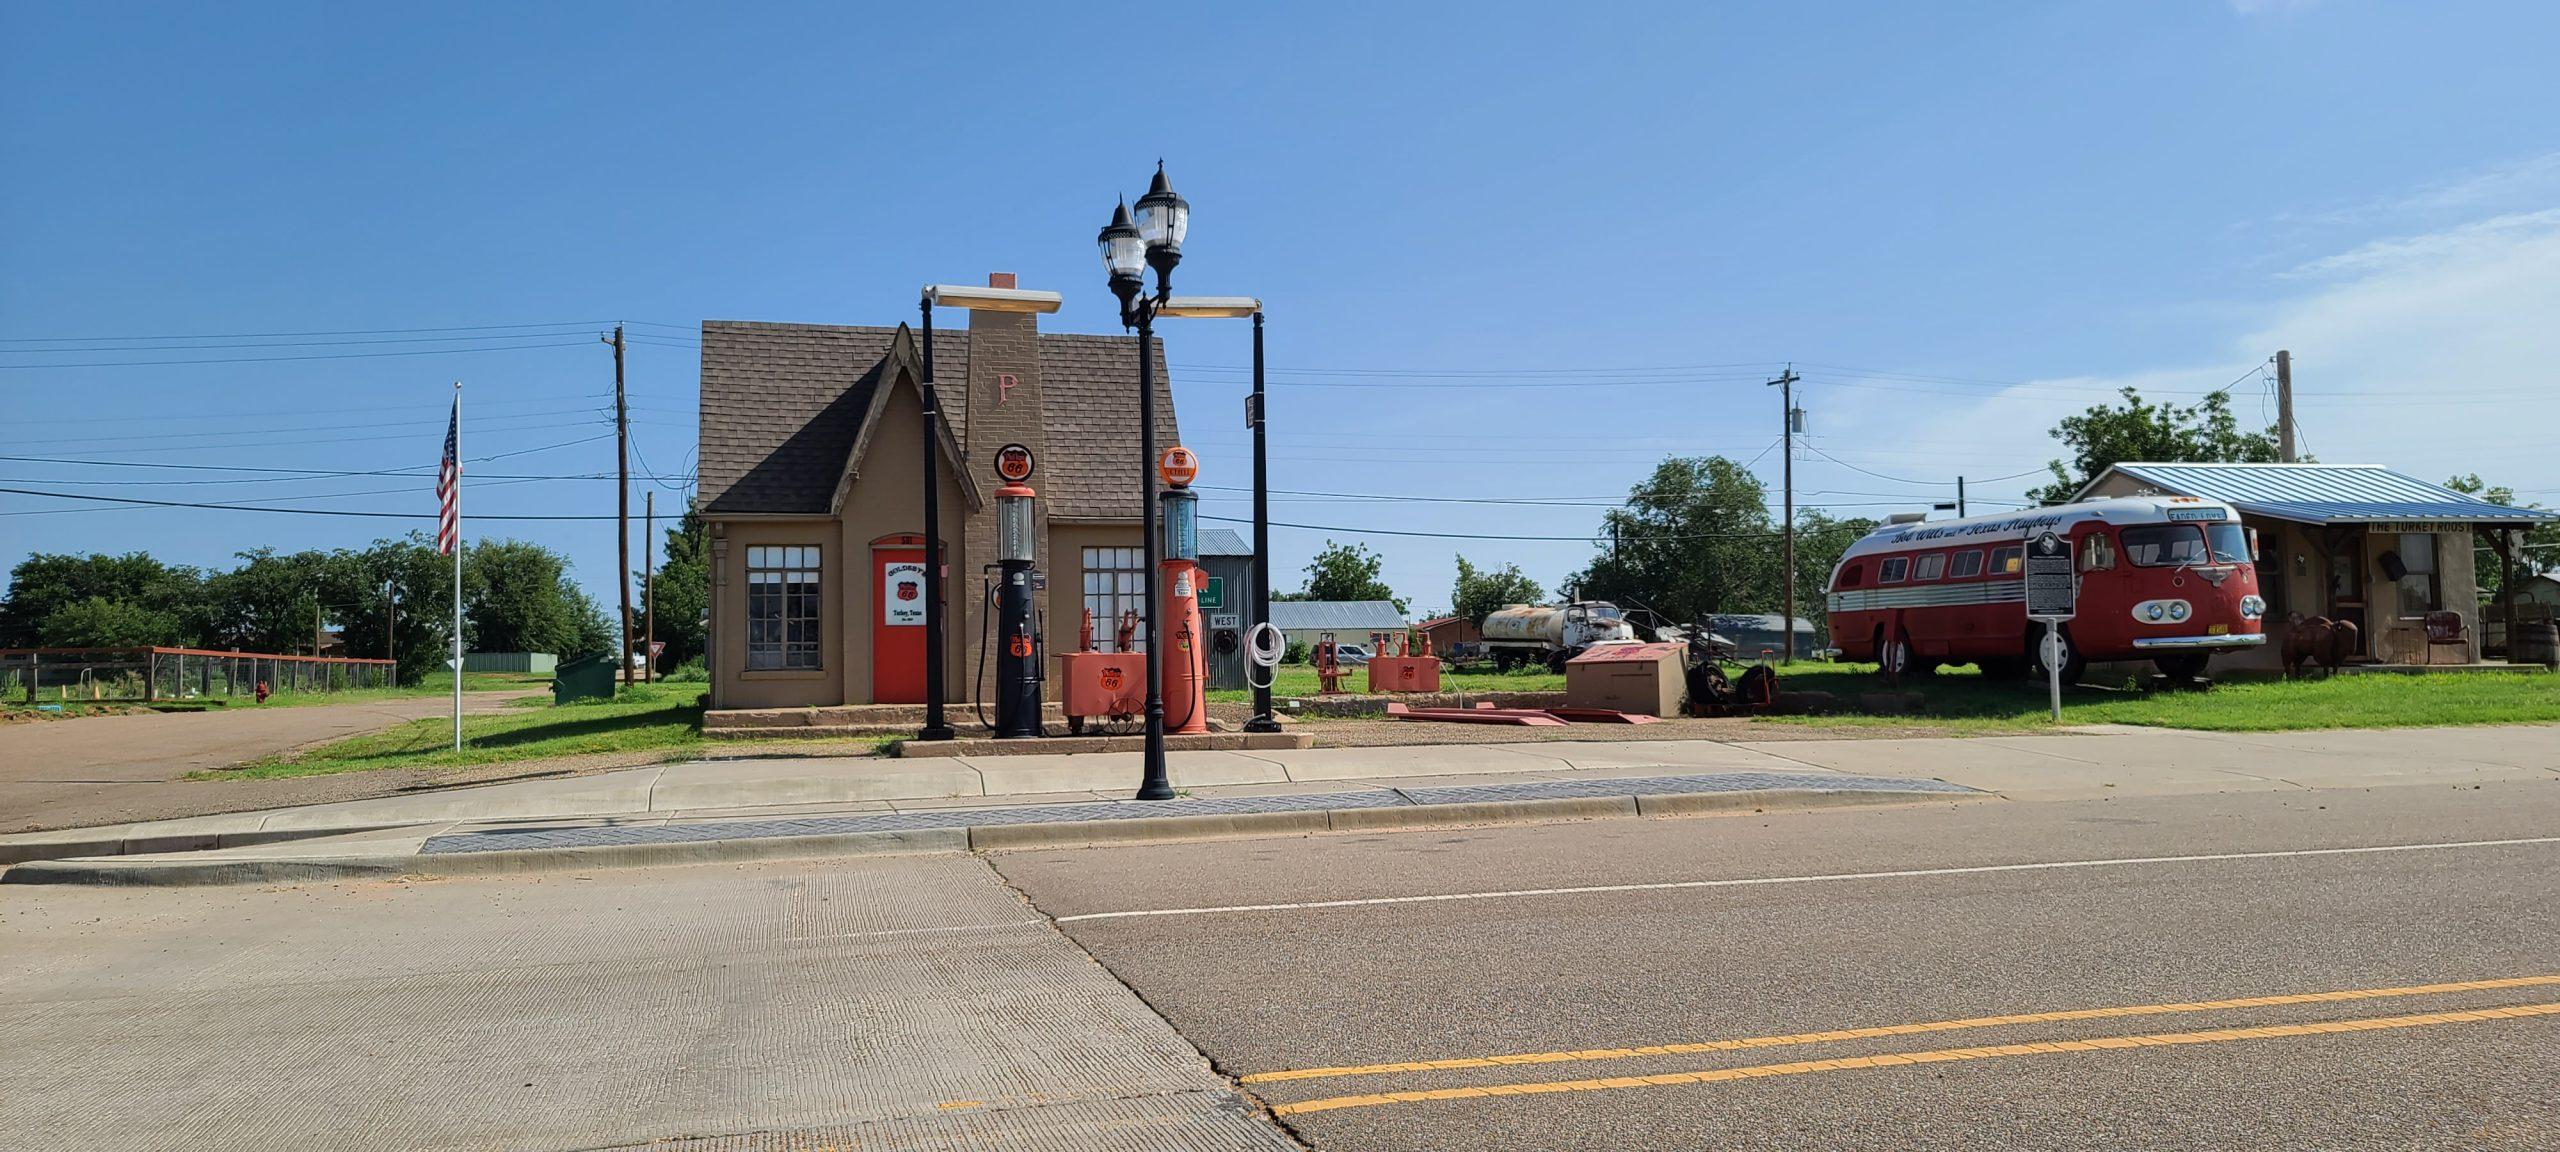 Phillips 66 Service Station in Turkey, Texas